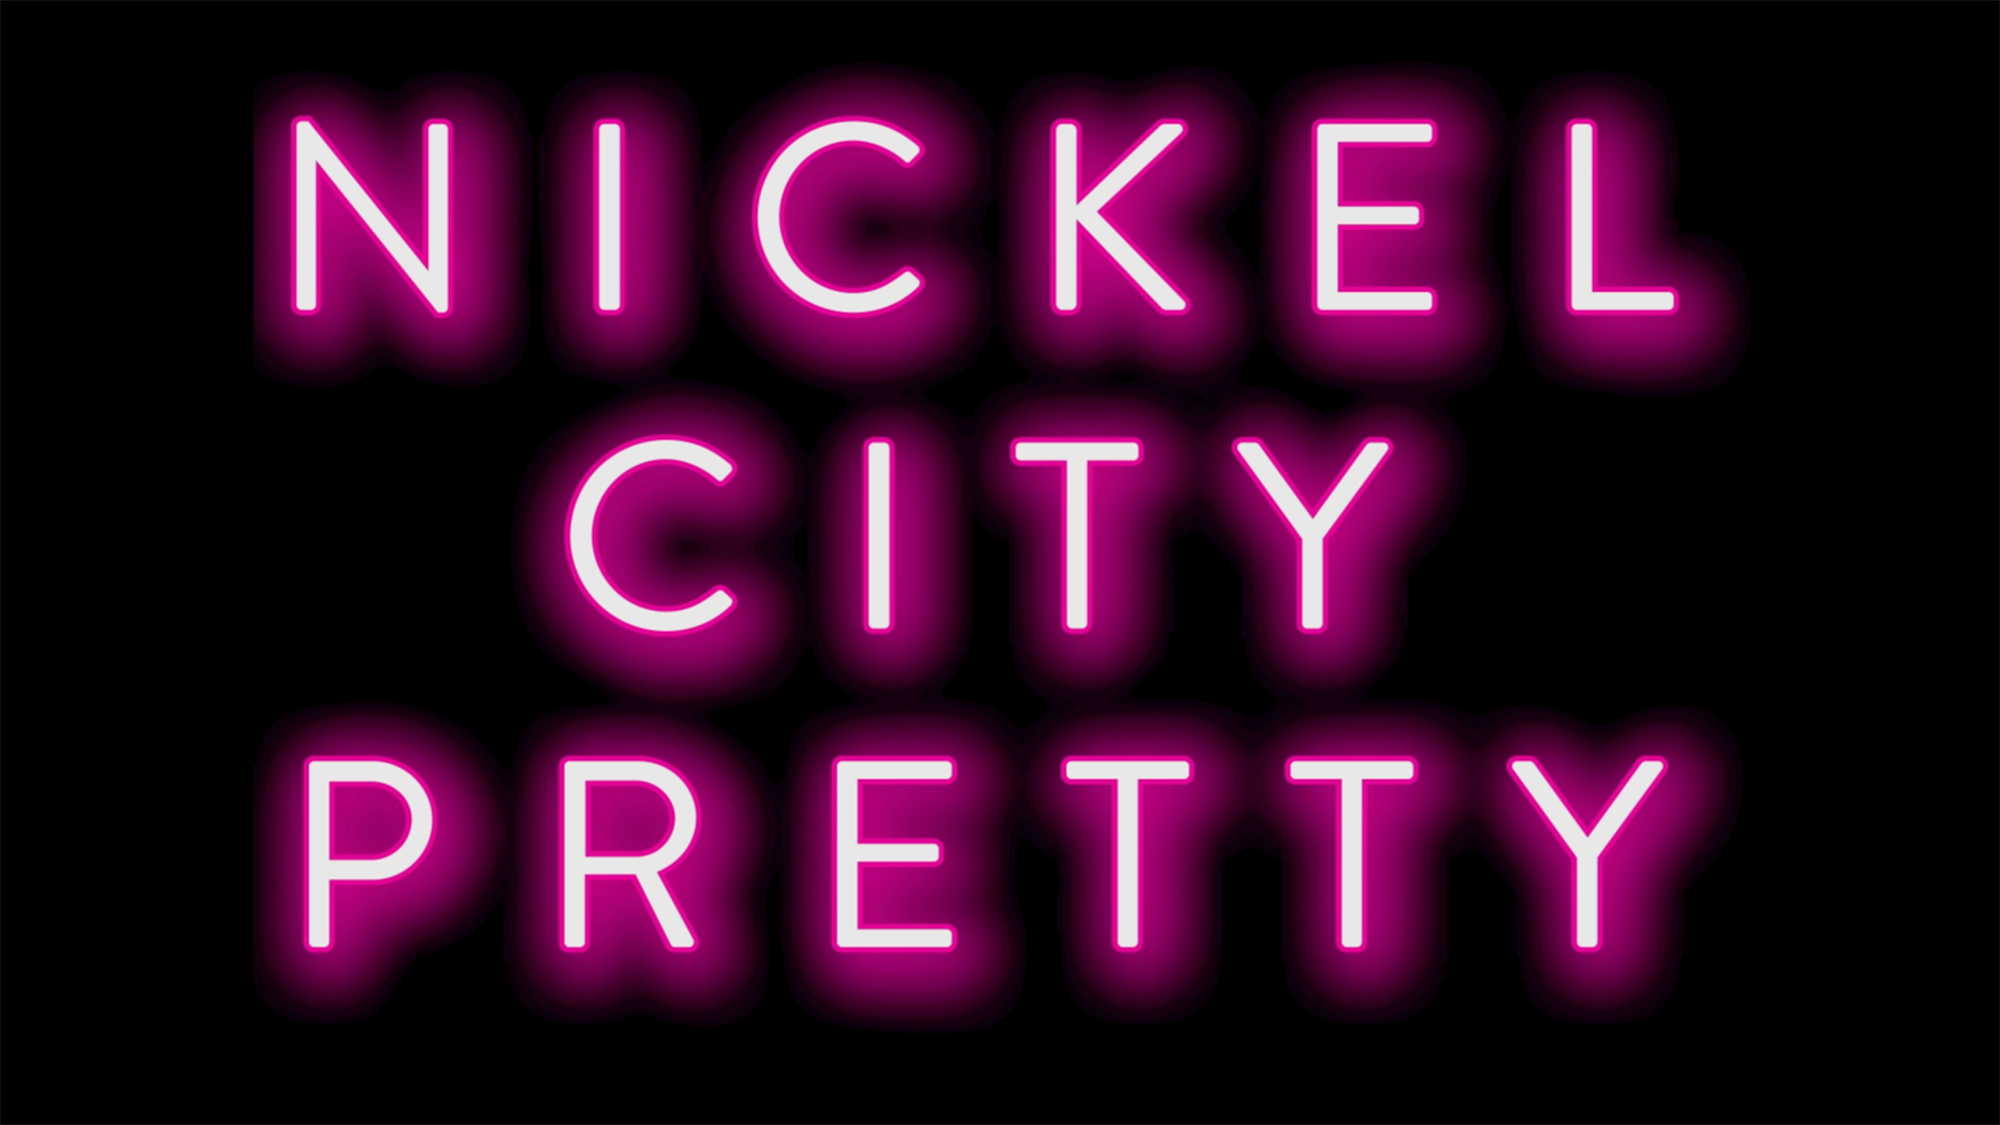 nickel-city-pretty-video-series.jpg